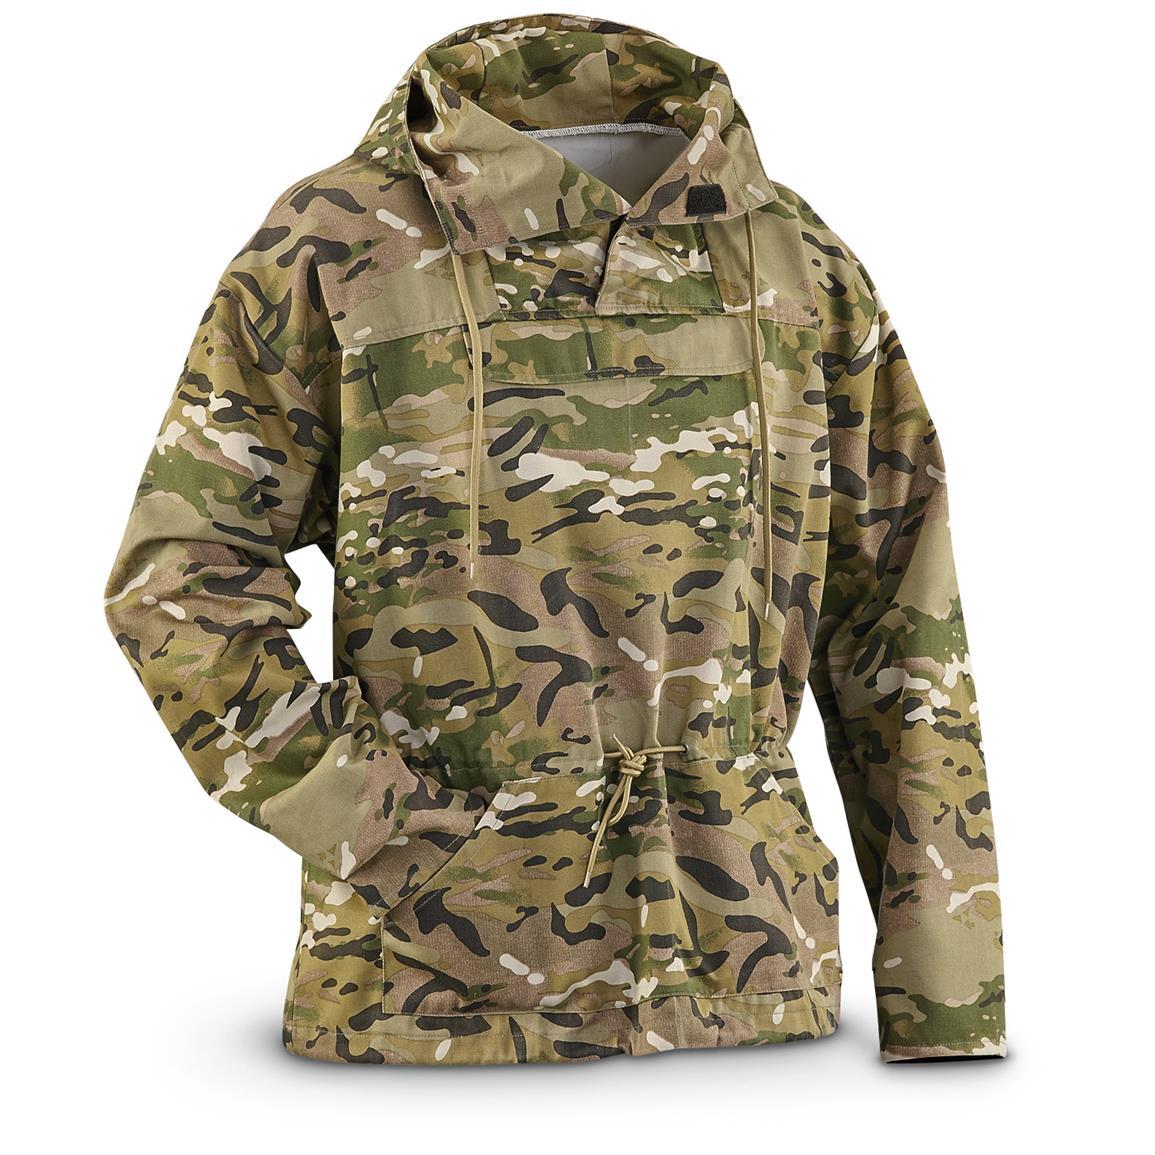 military jacket u.s. military surplus menu0027s ocp camo anorak jacket, new JBFAINL